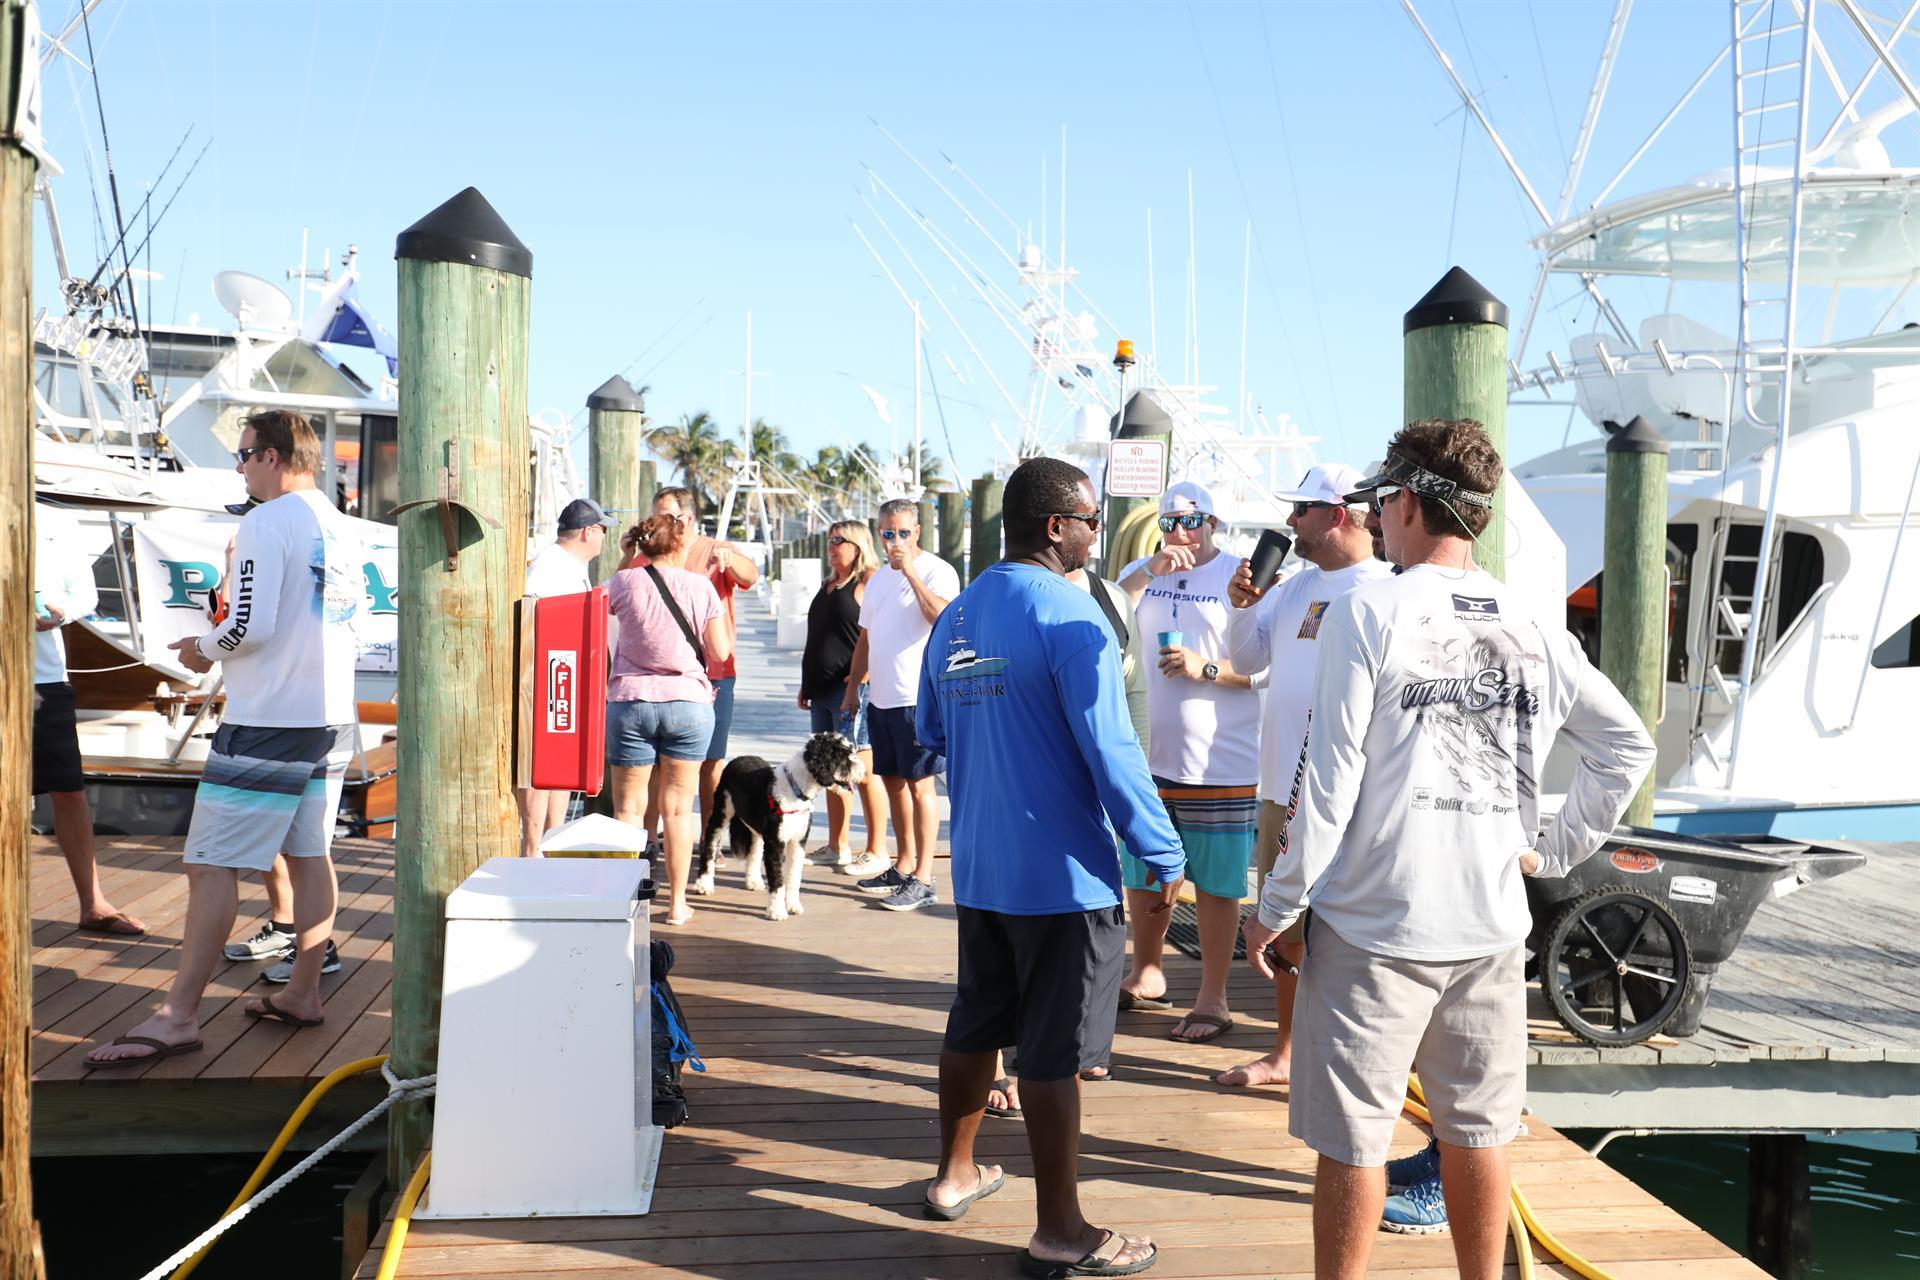 Viking Challenge Key West Challenge Board Walk